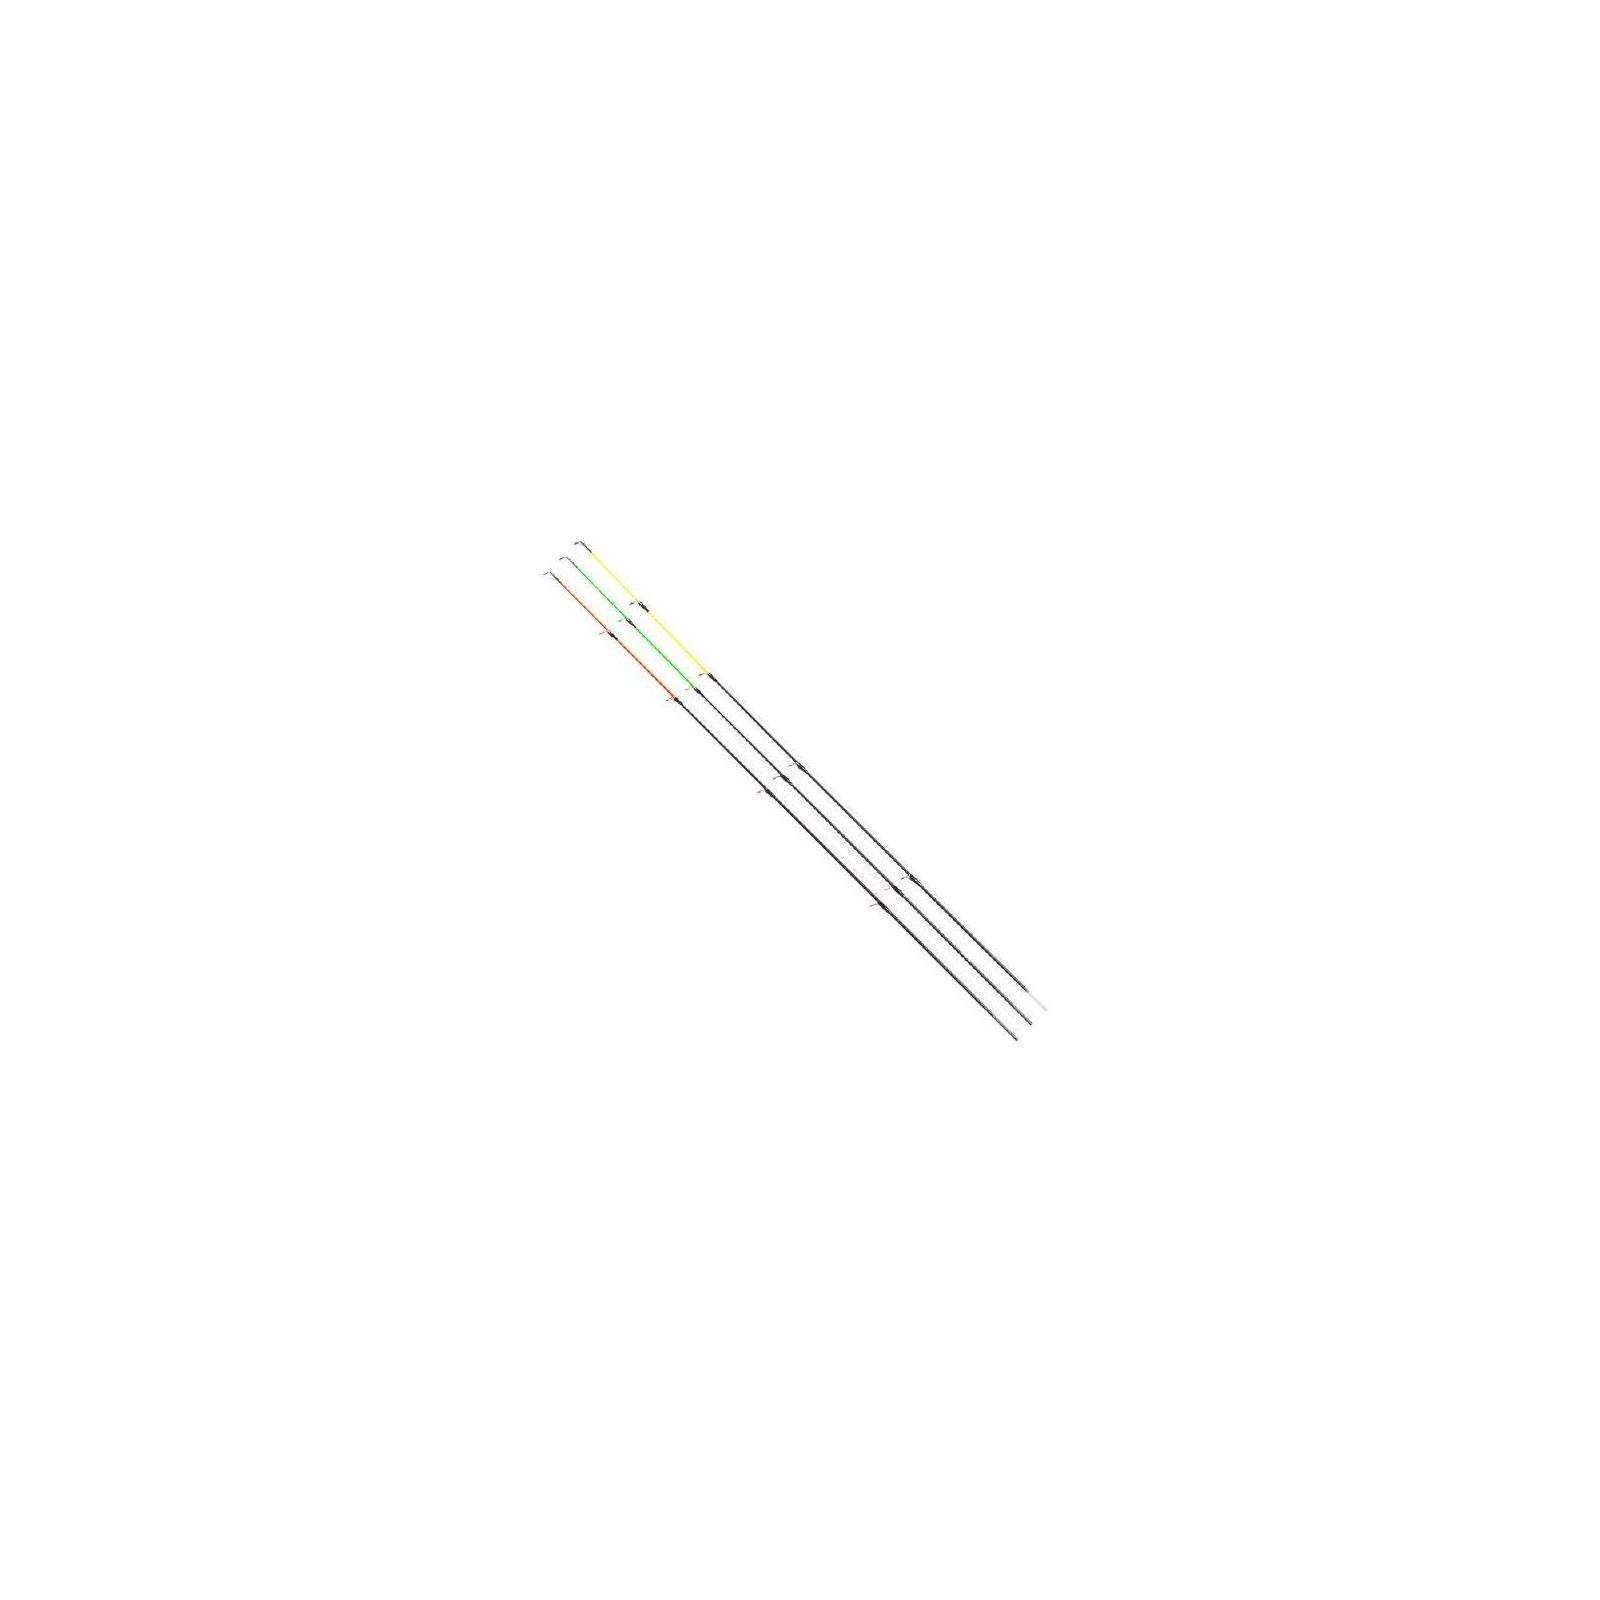 Удилище Brain fishing Apex APX330-70 3.30m max 70g (1858.40.79) изображение 3